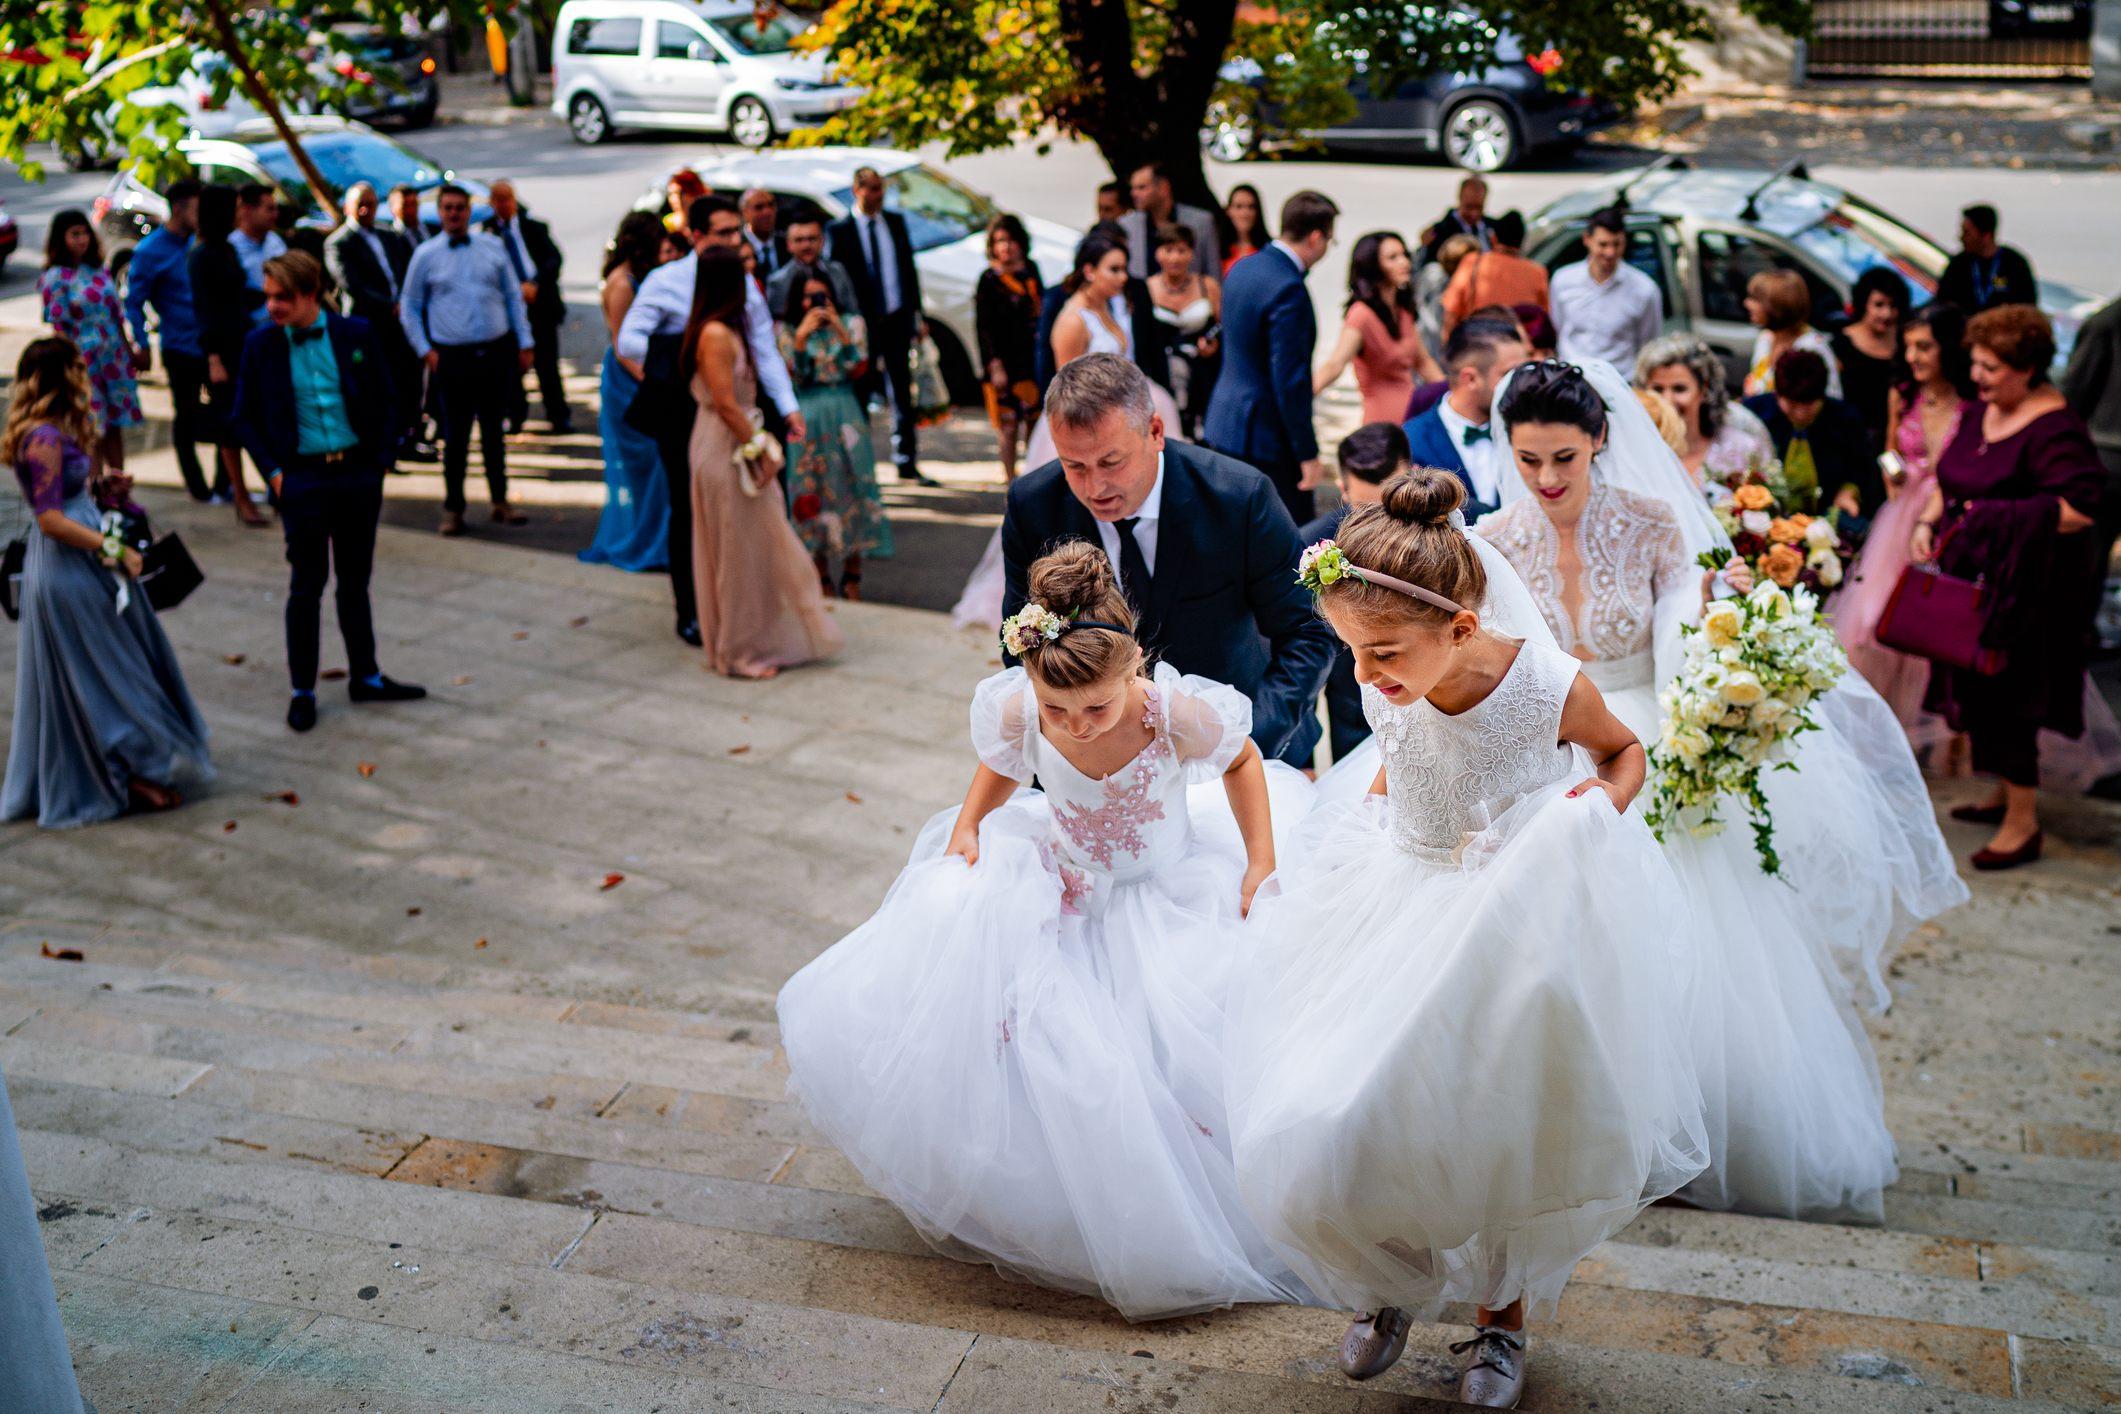 fotograf nunta bucuresti laurentiu nica  8 - Lorena & Matei | Fotografii nunta Bucuresti | Restaurant Domeniul cu Ciresi